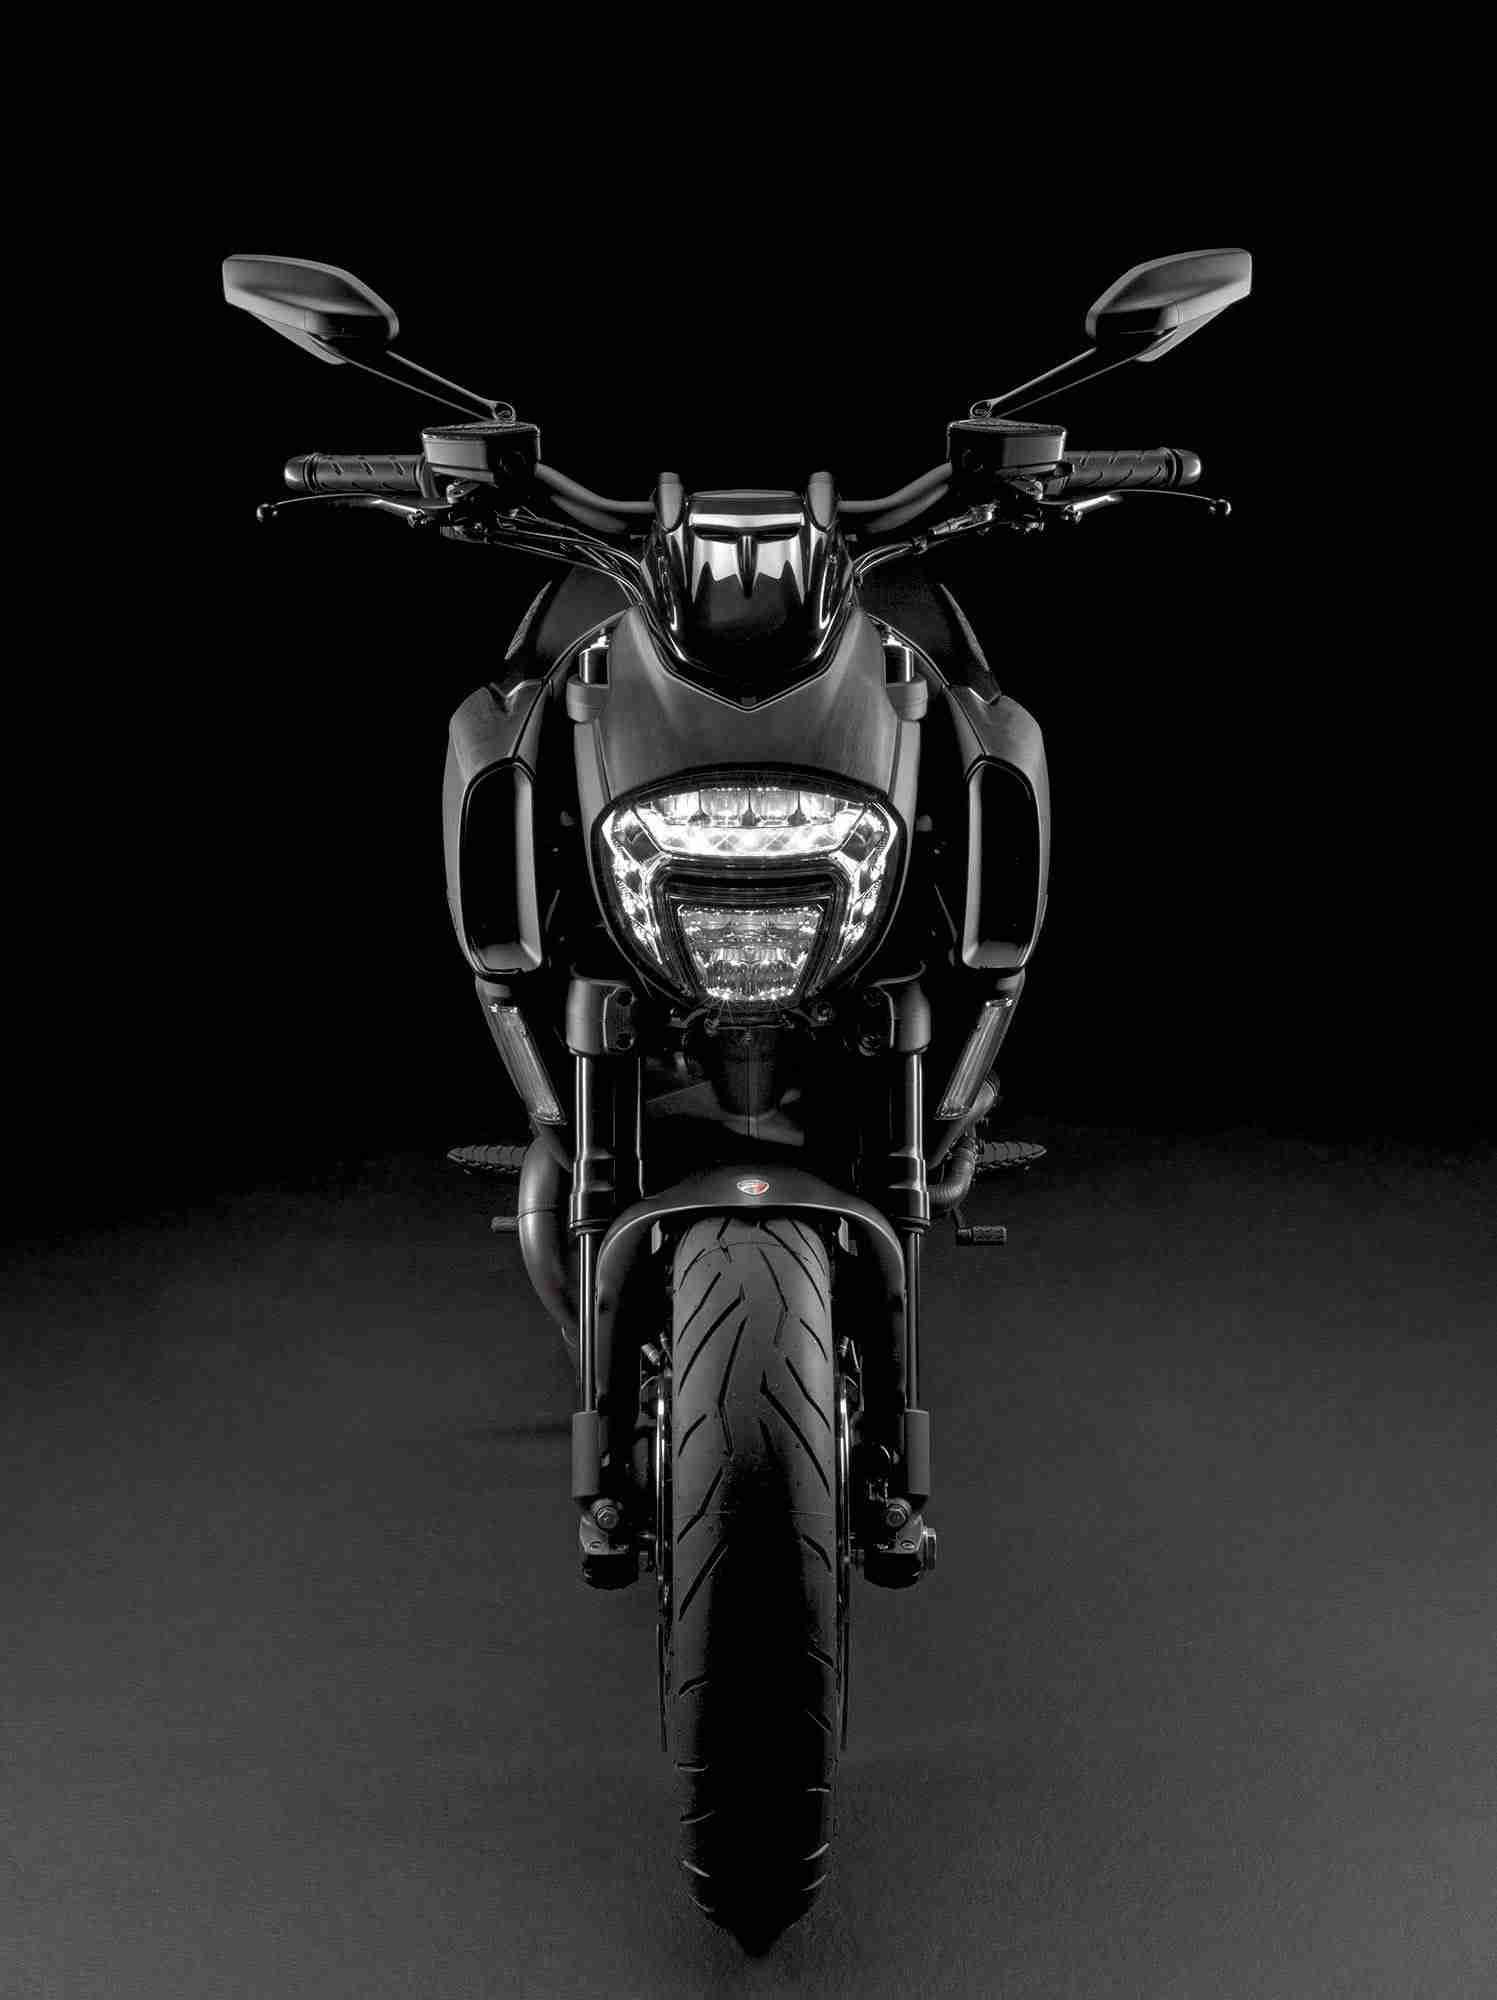 2015 Ducati Diavel - 17